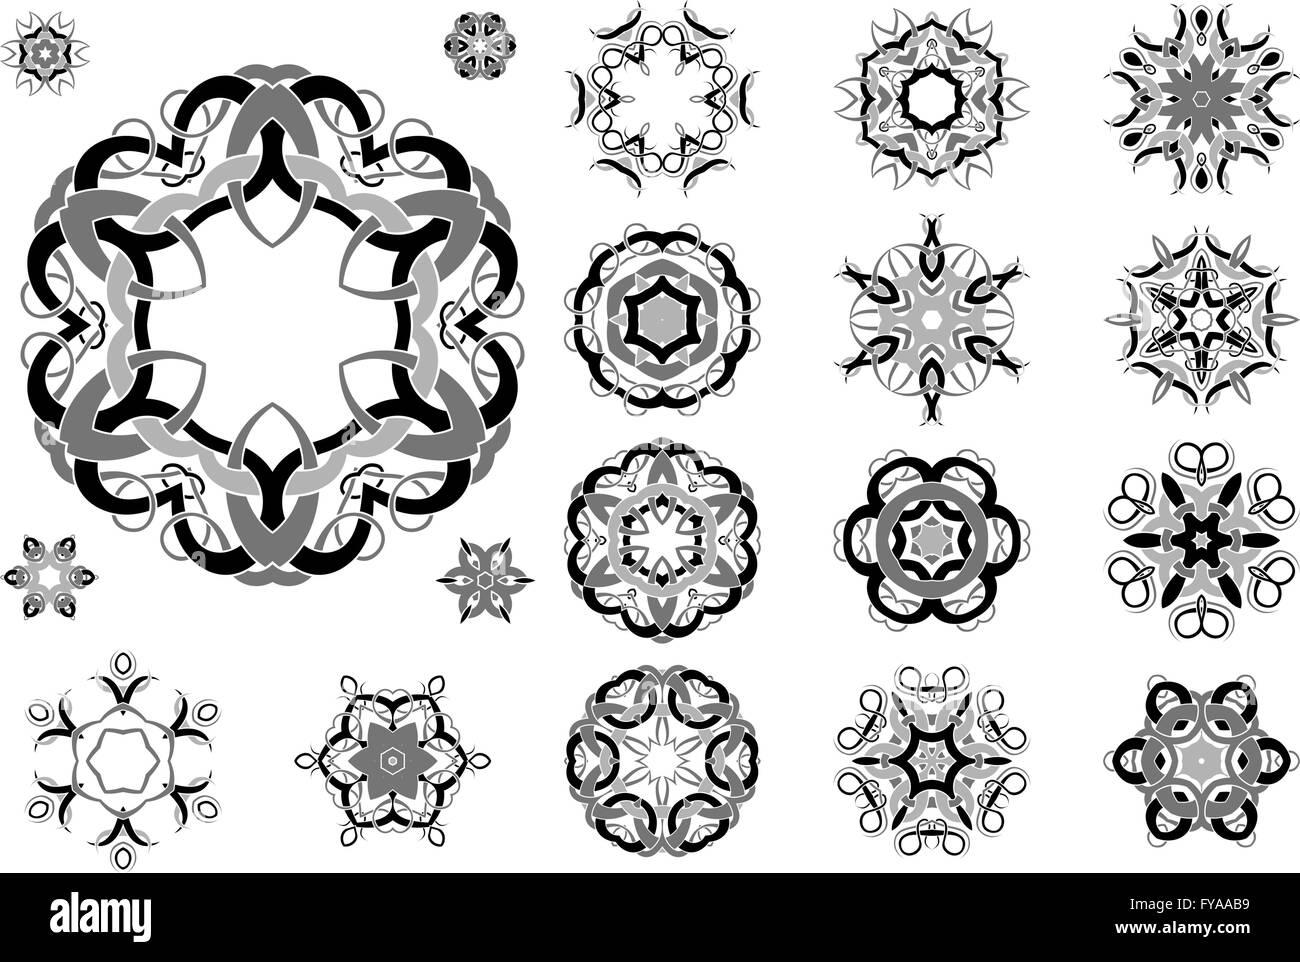 Celtic Floral Tattoo Designs